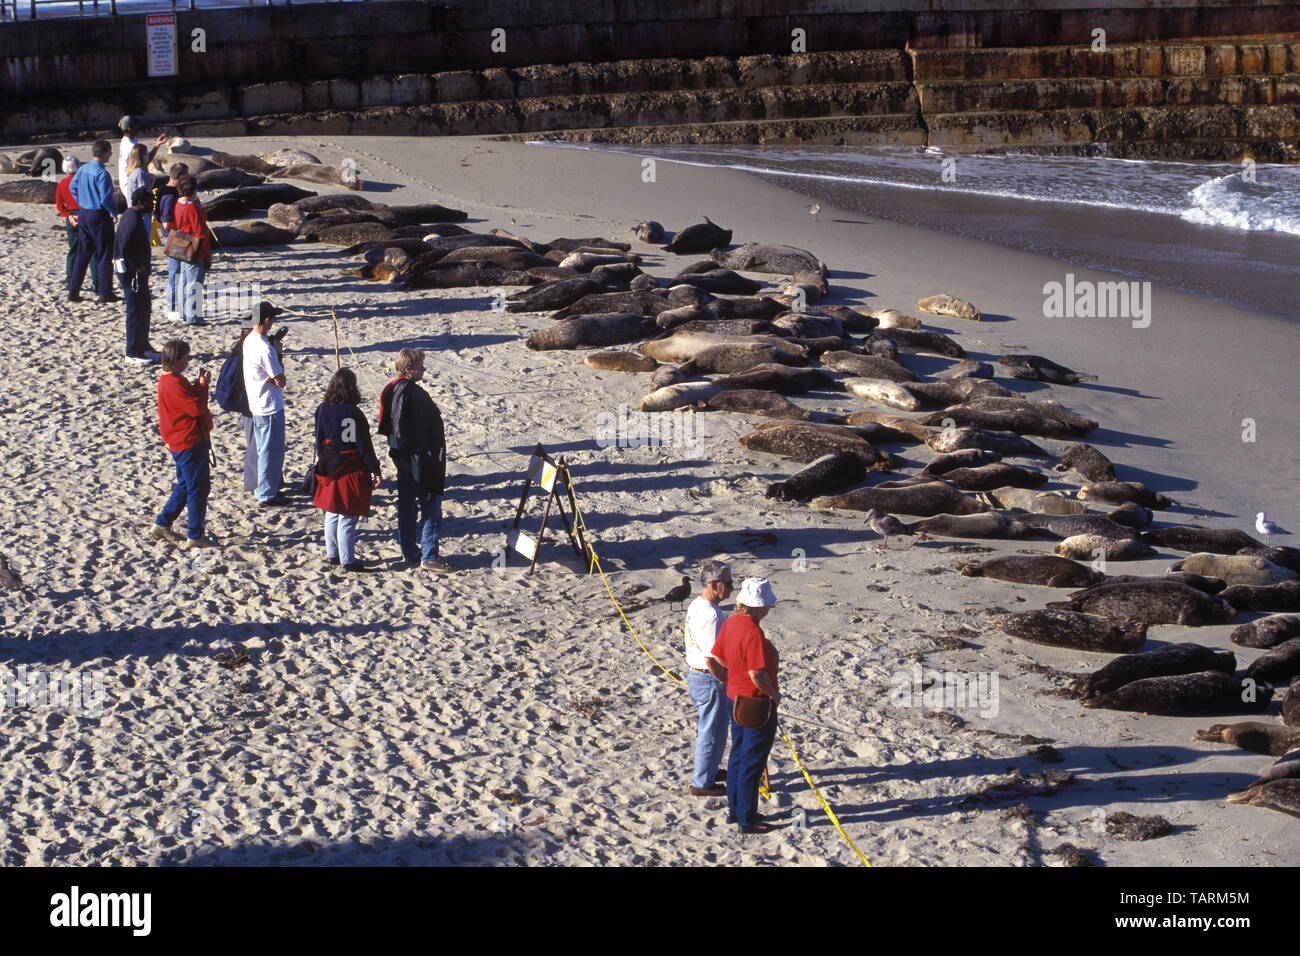 Harbor Seal - Phoca vitulina People watching seals resting on the beach, La Jolla, San Diego County, California - Stock Image